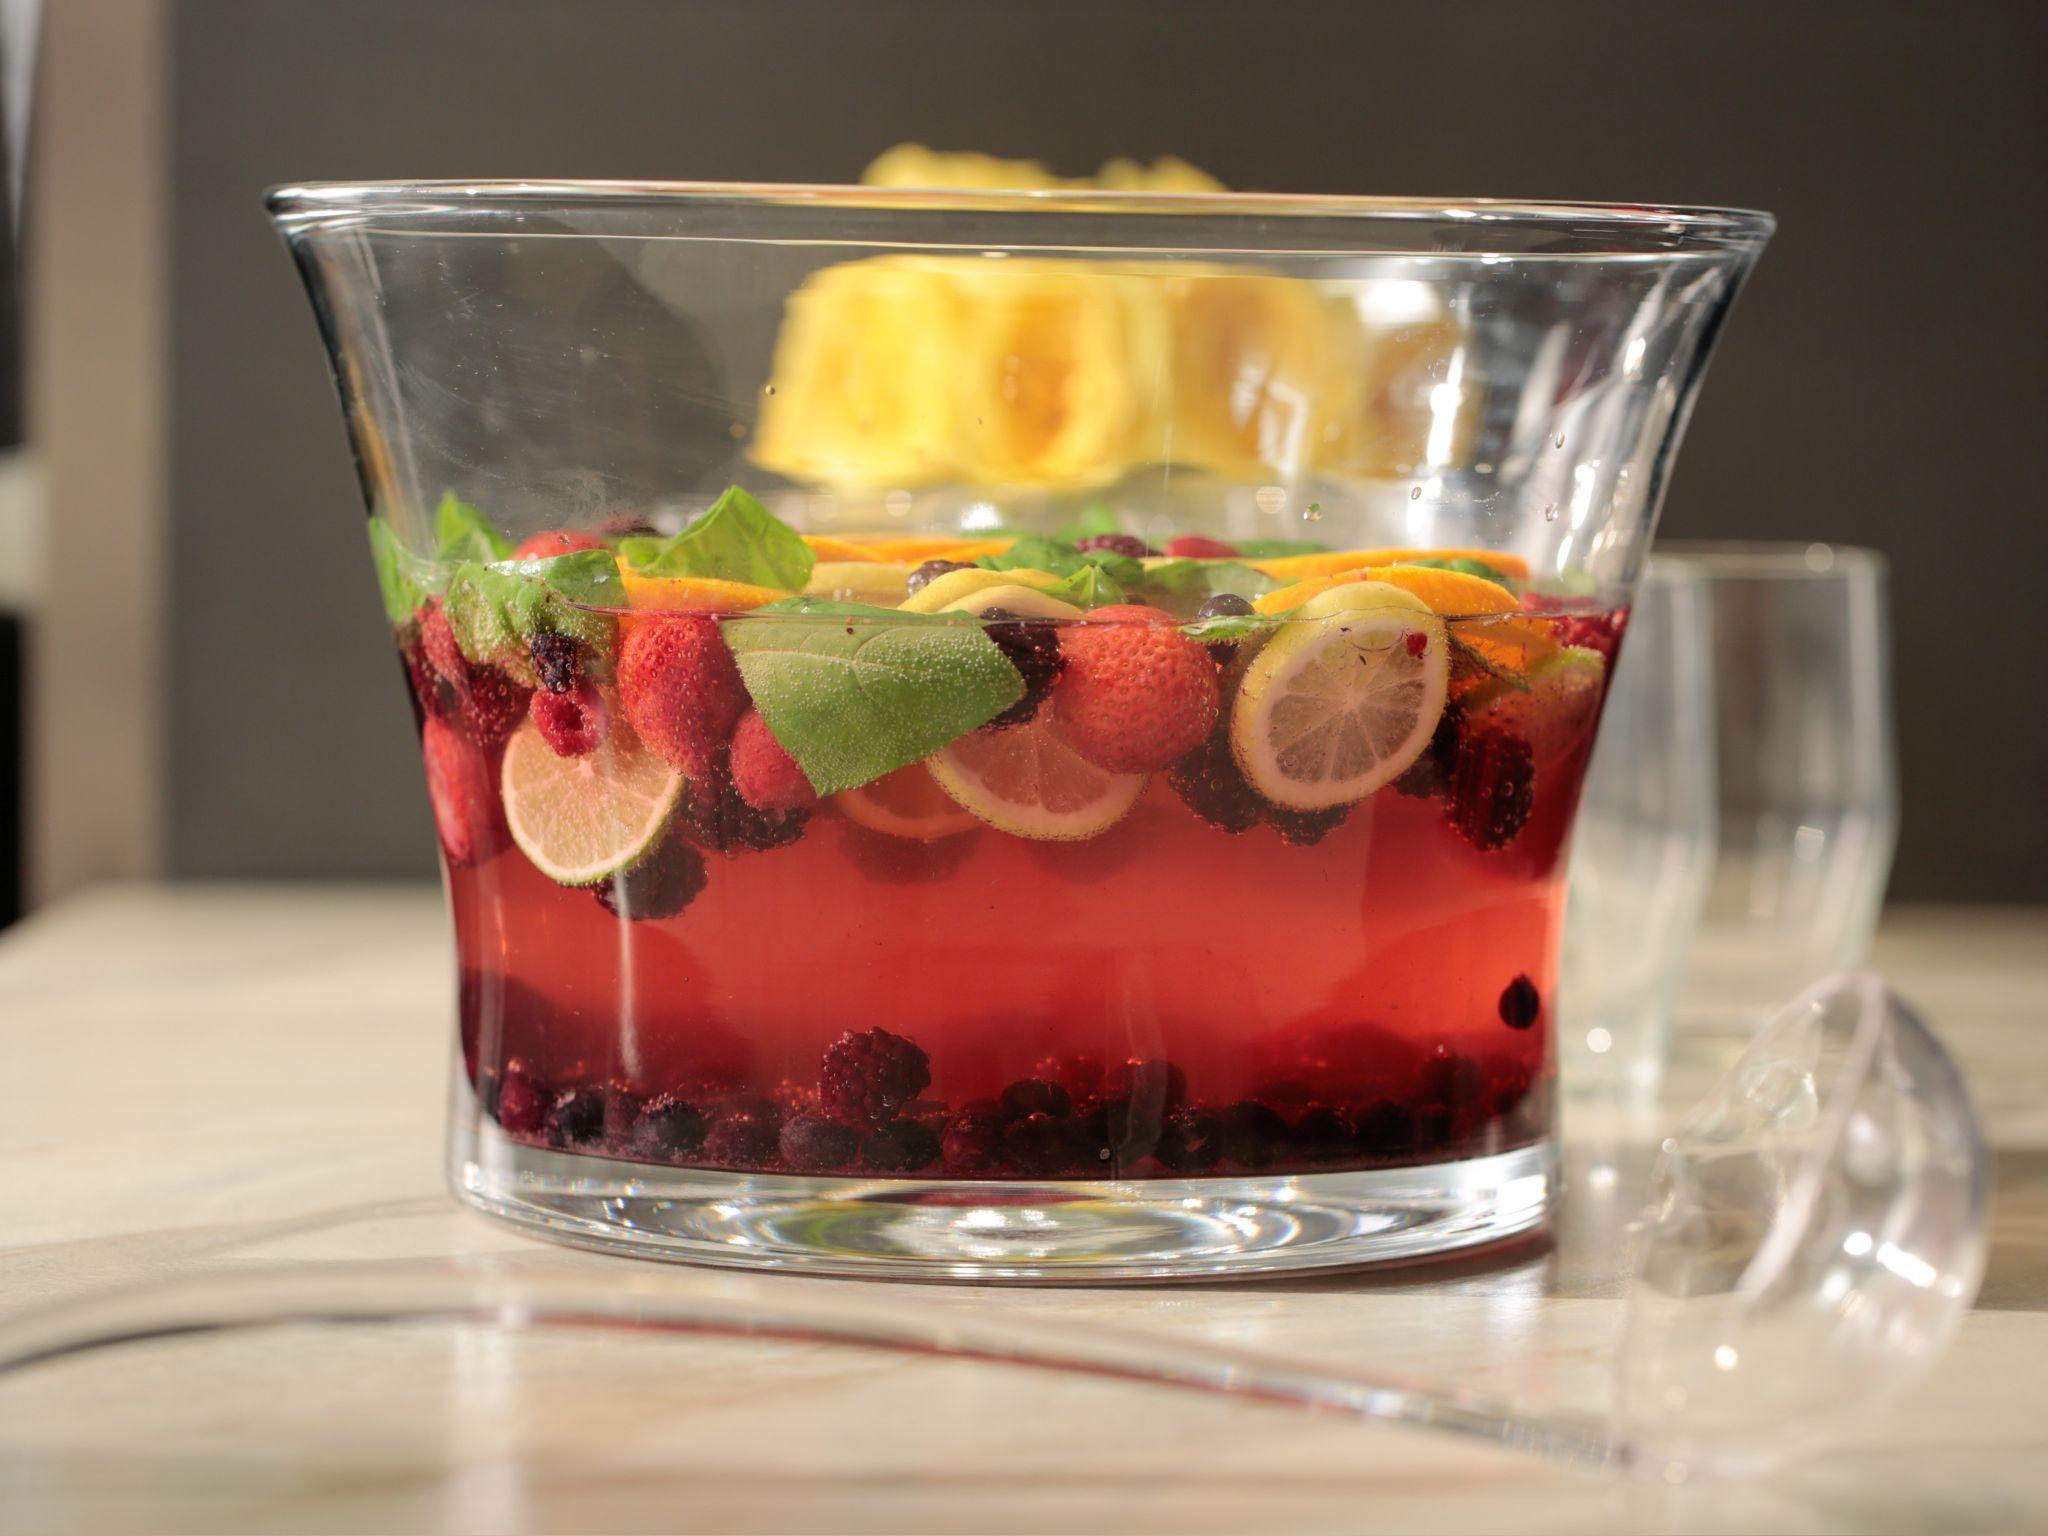 Frozen Fruit Sparkling Water Recipe Frozen Fruit Food Network Recipes Sparkling Water Recipes